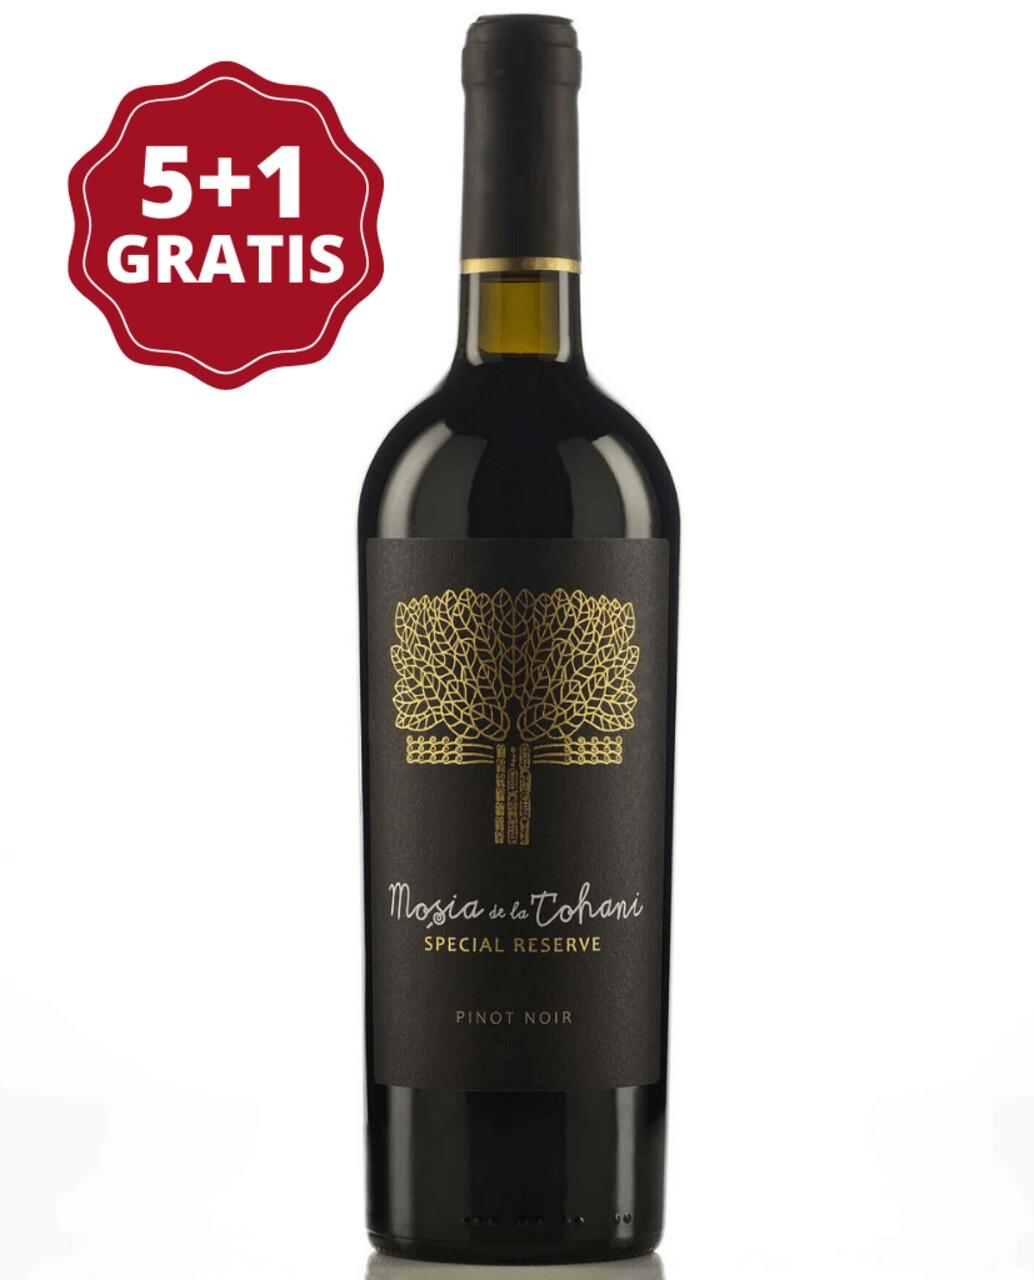 Mosia de la Tohani Special Reserve Pinot Noir 5+1